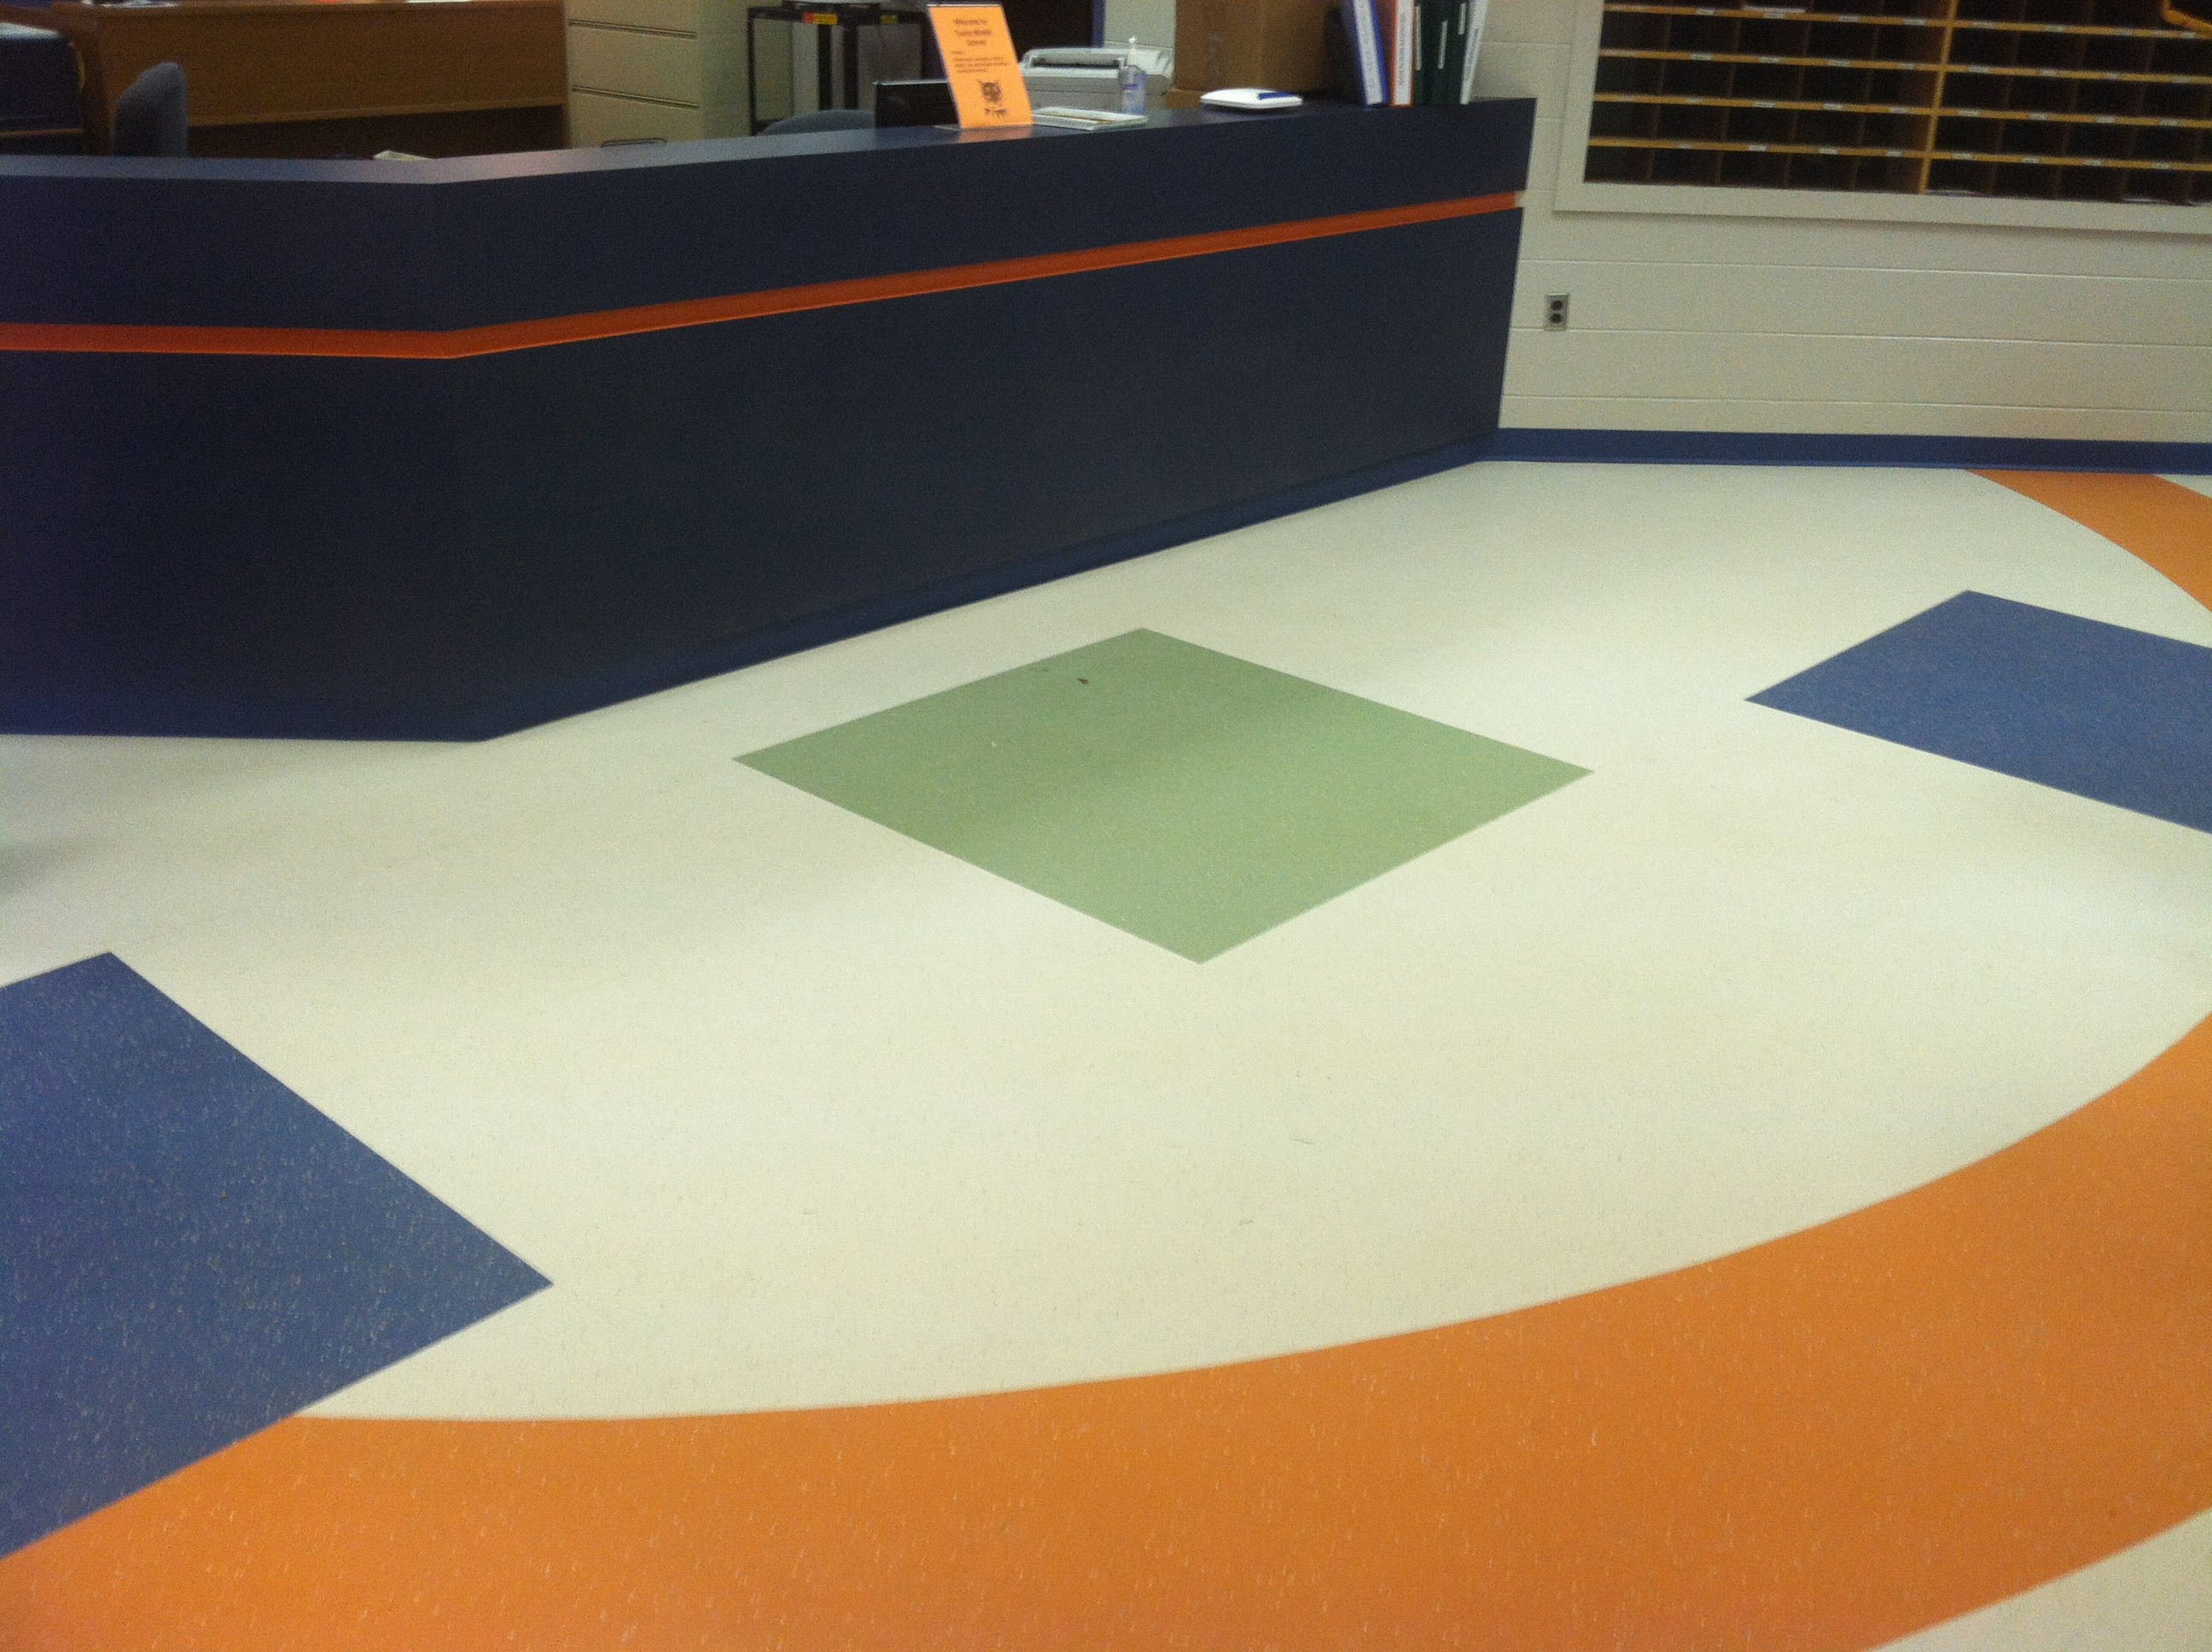 Haywood Floor Covering Inc.